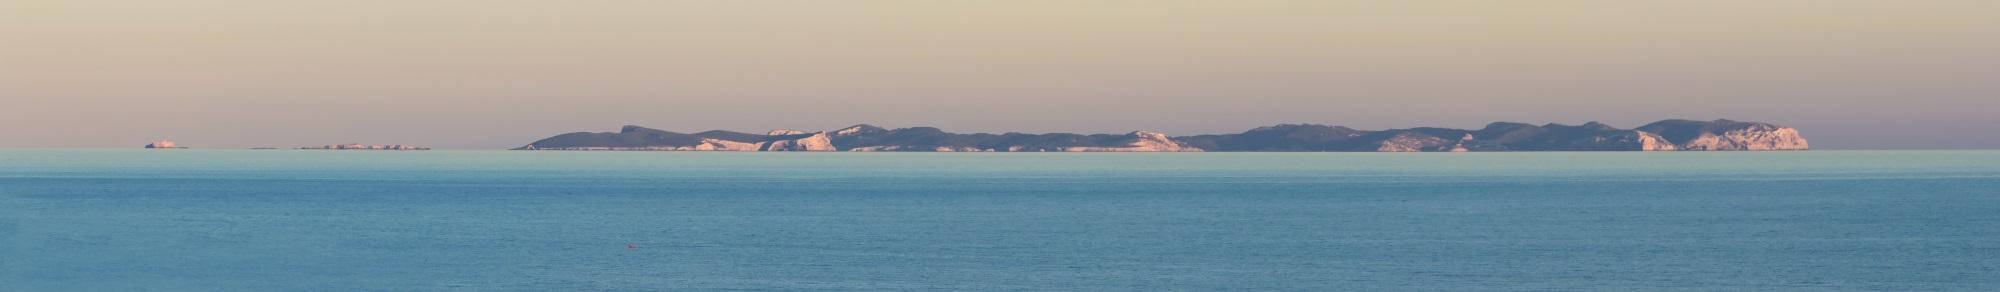 Cabrera Insel Panorama